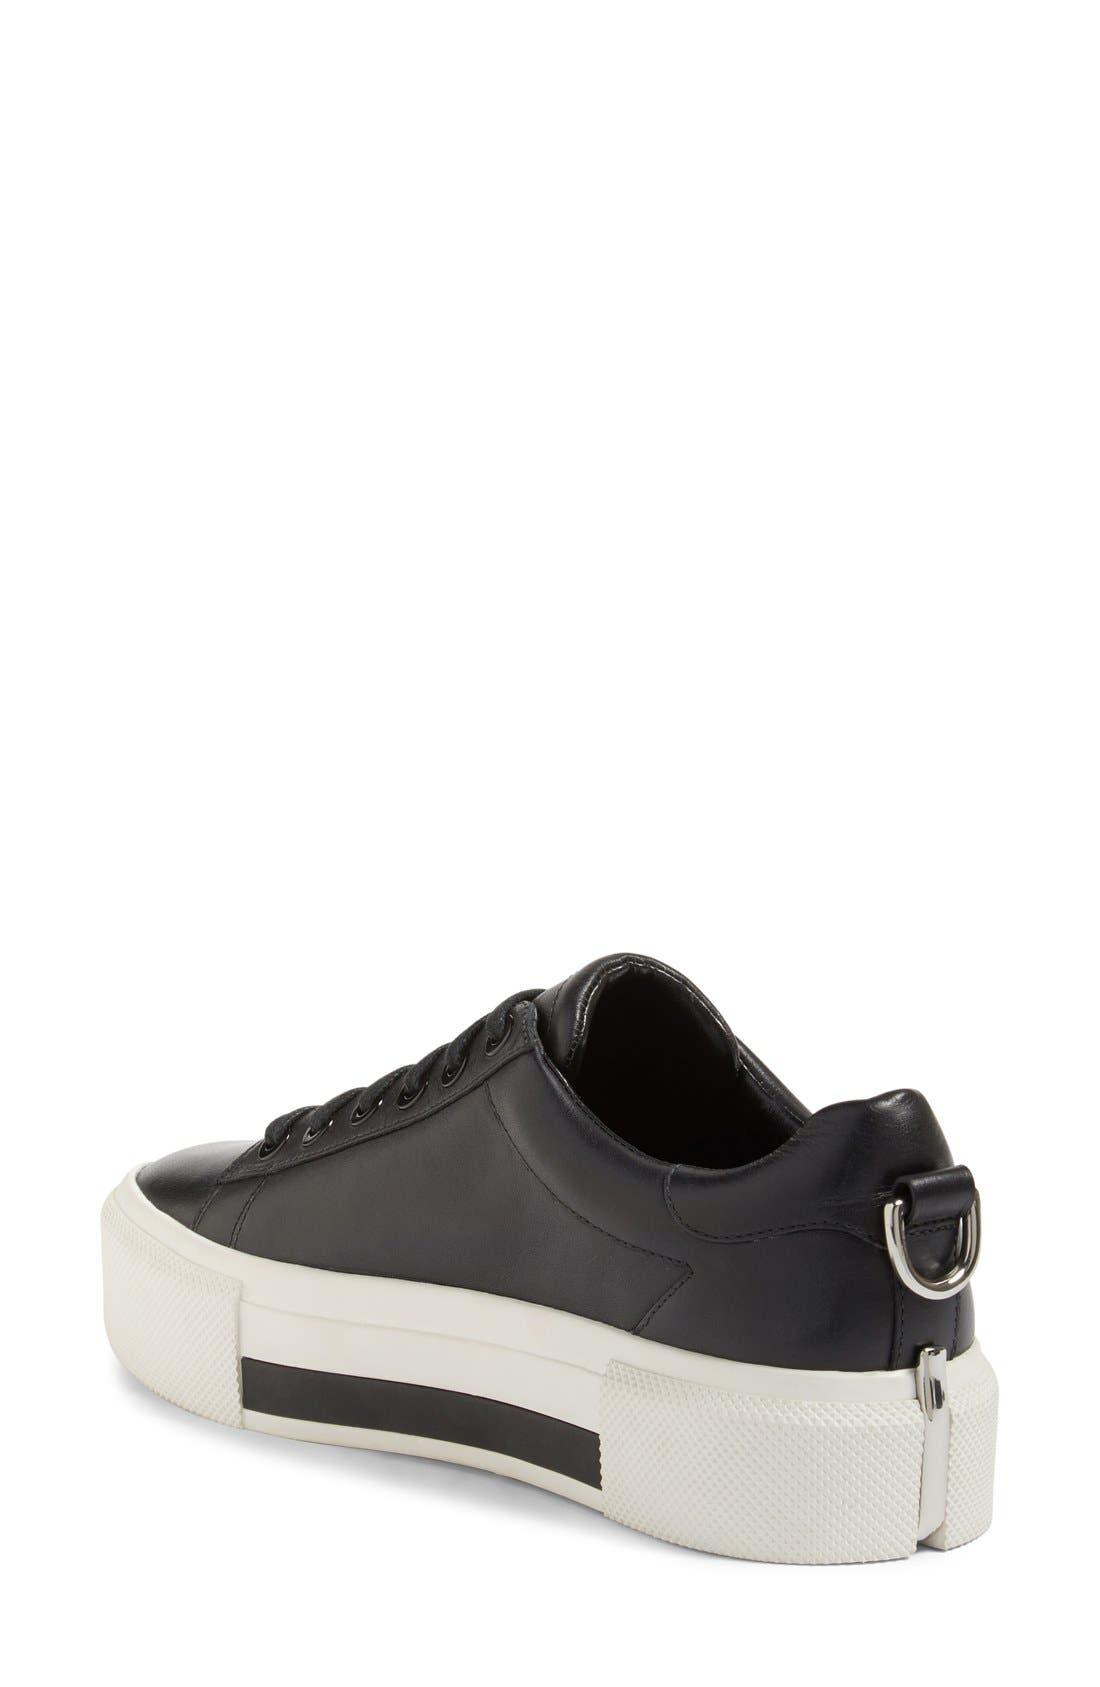 KENDALL + KYLIE Tyler Platform Sneaker